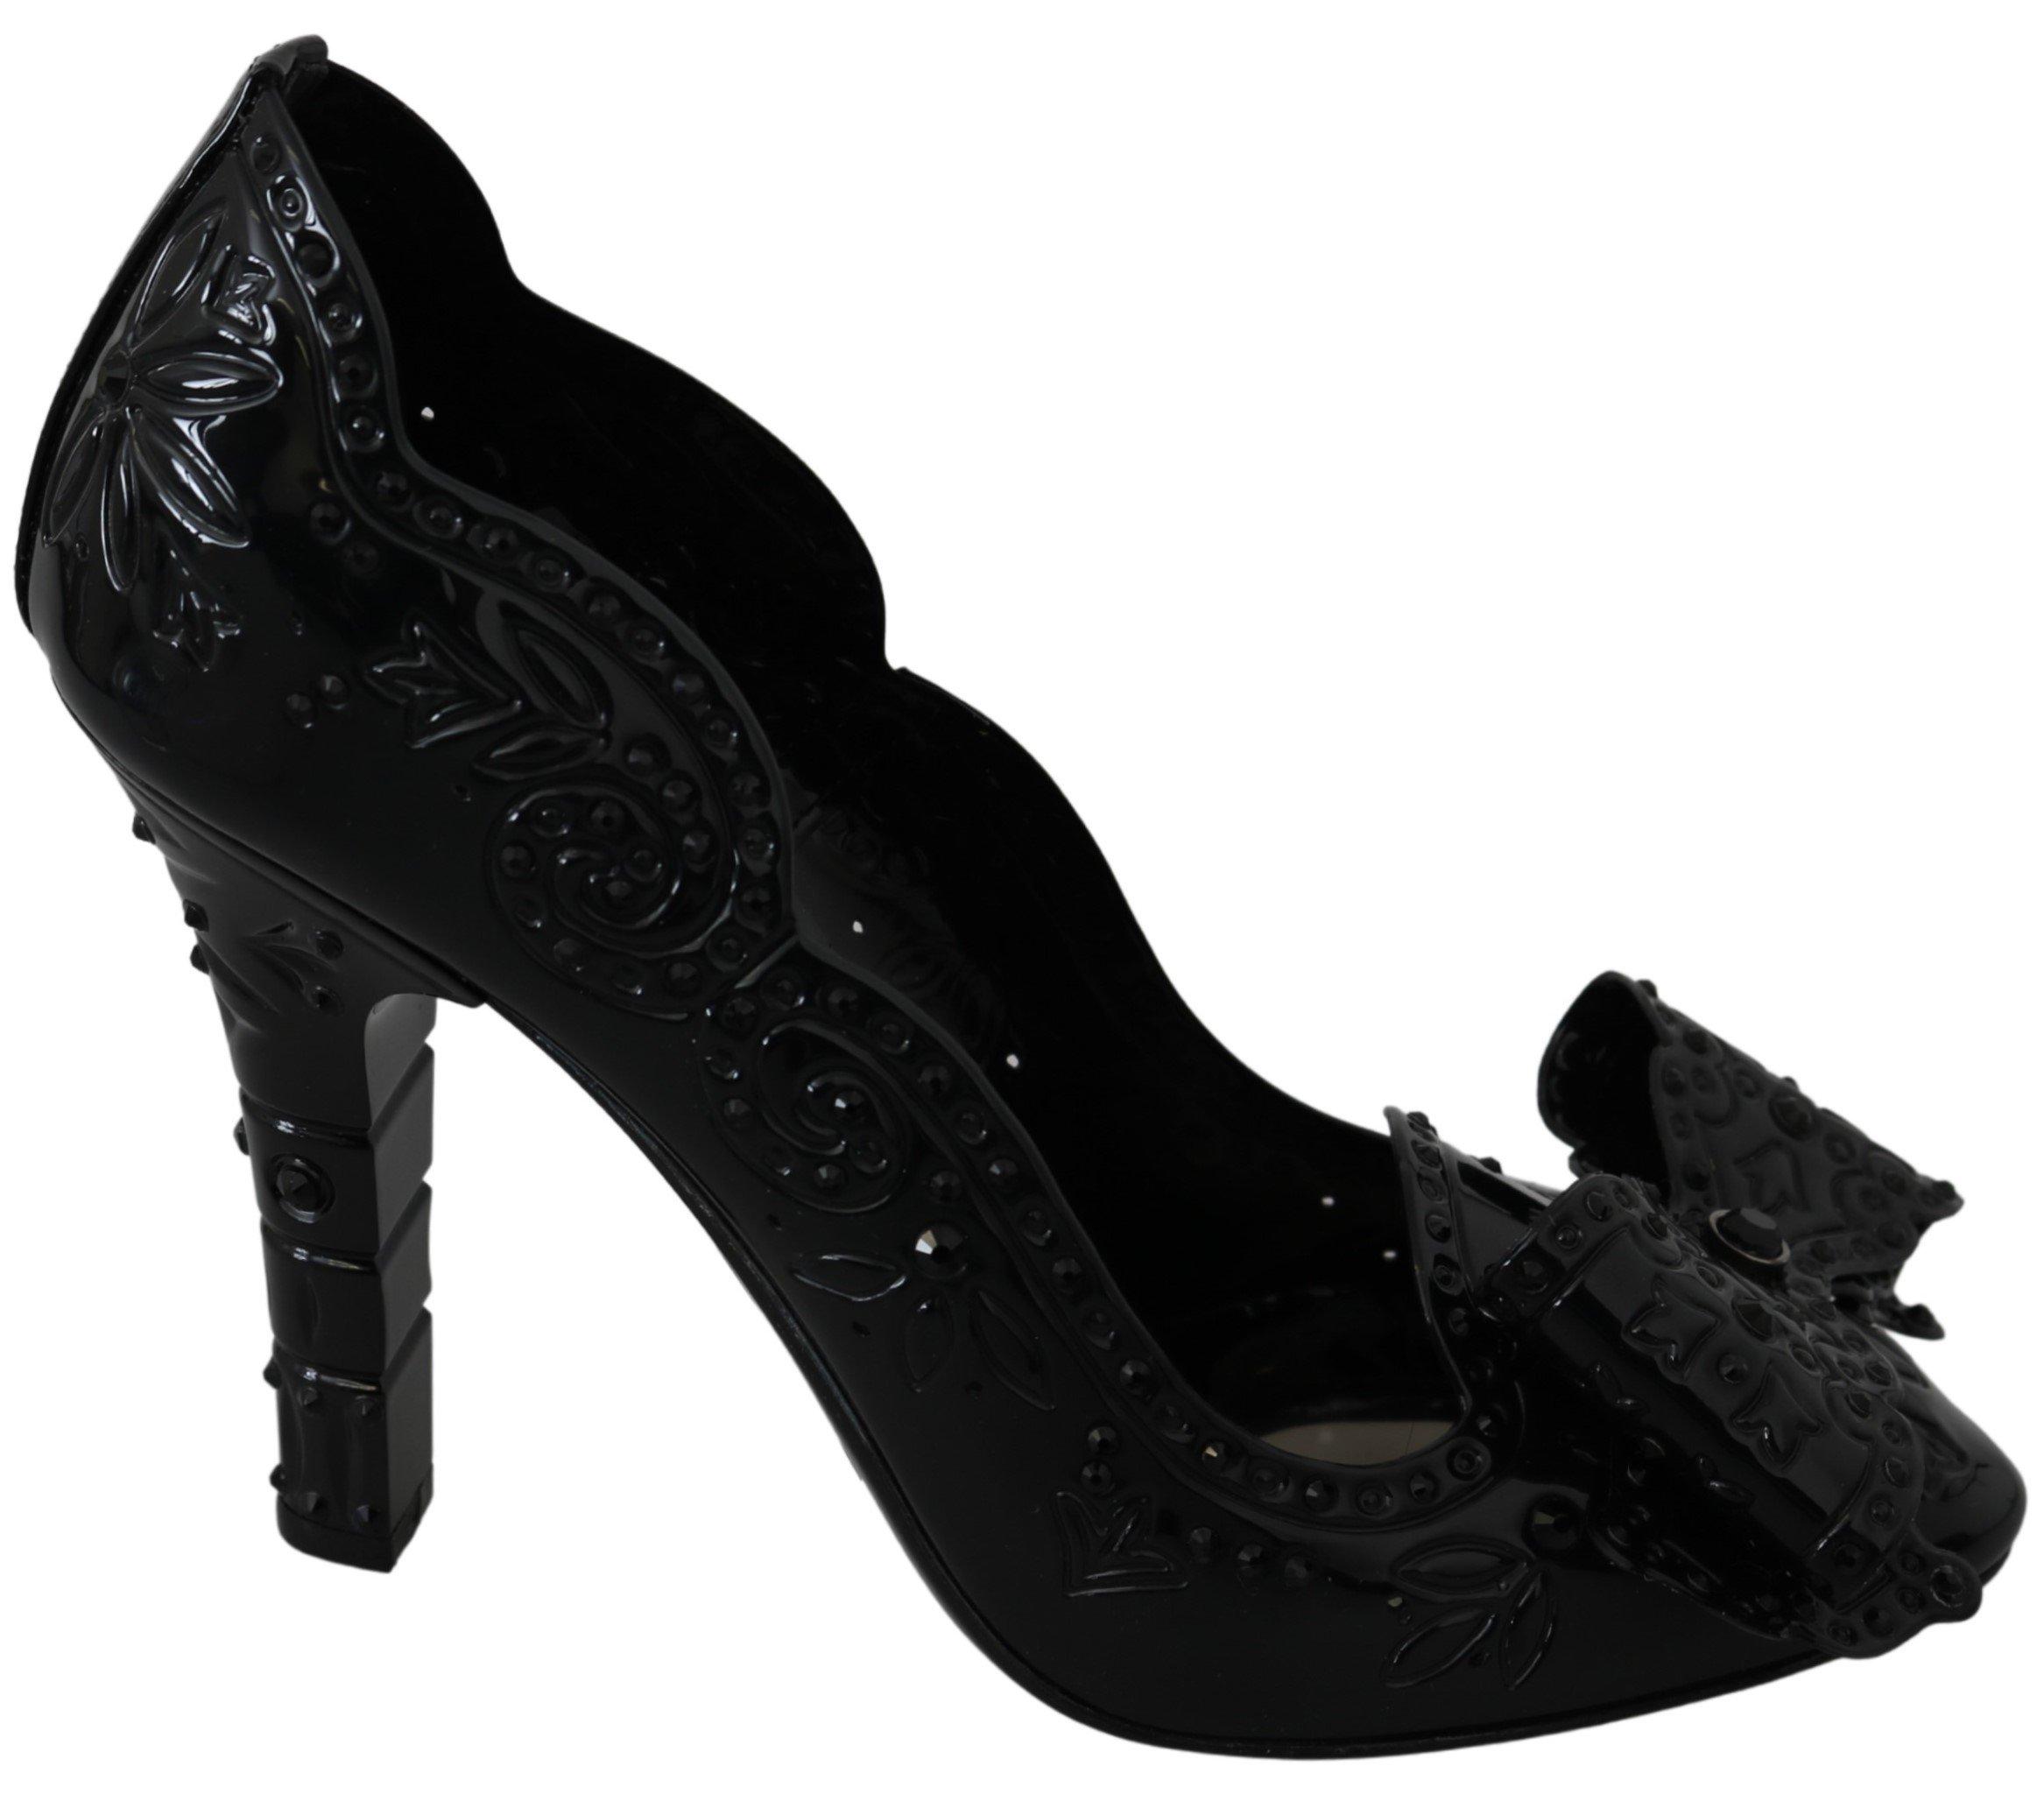 Dolce & Gabbana Women's Ribbon Crystal CINDERELLA Pumps Black LA7280 - EU38/US7.5